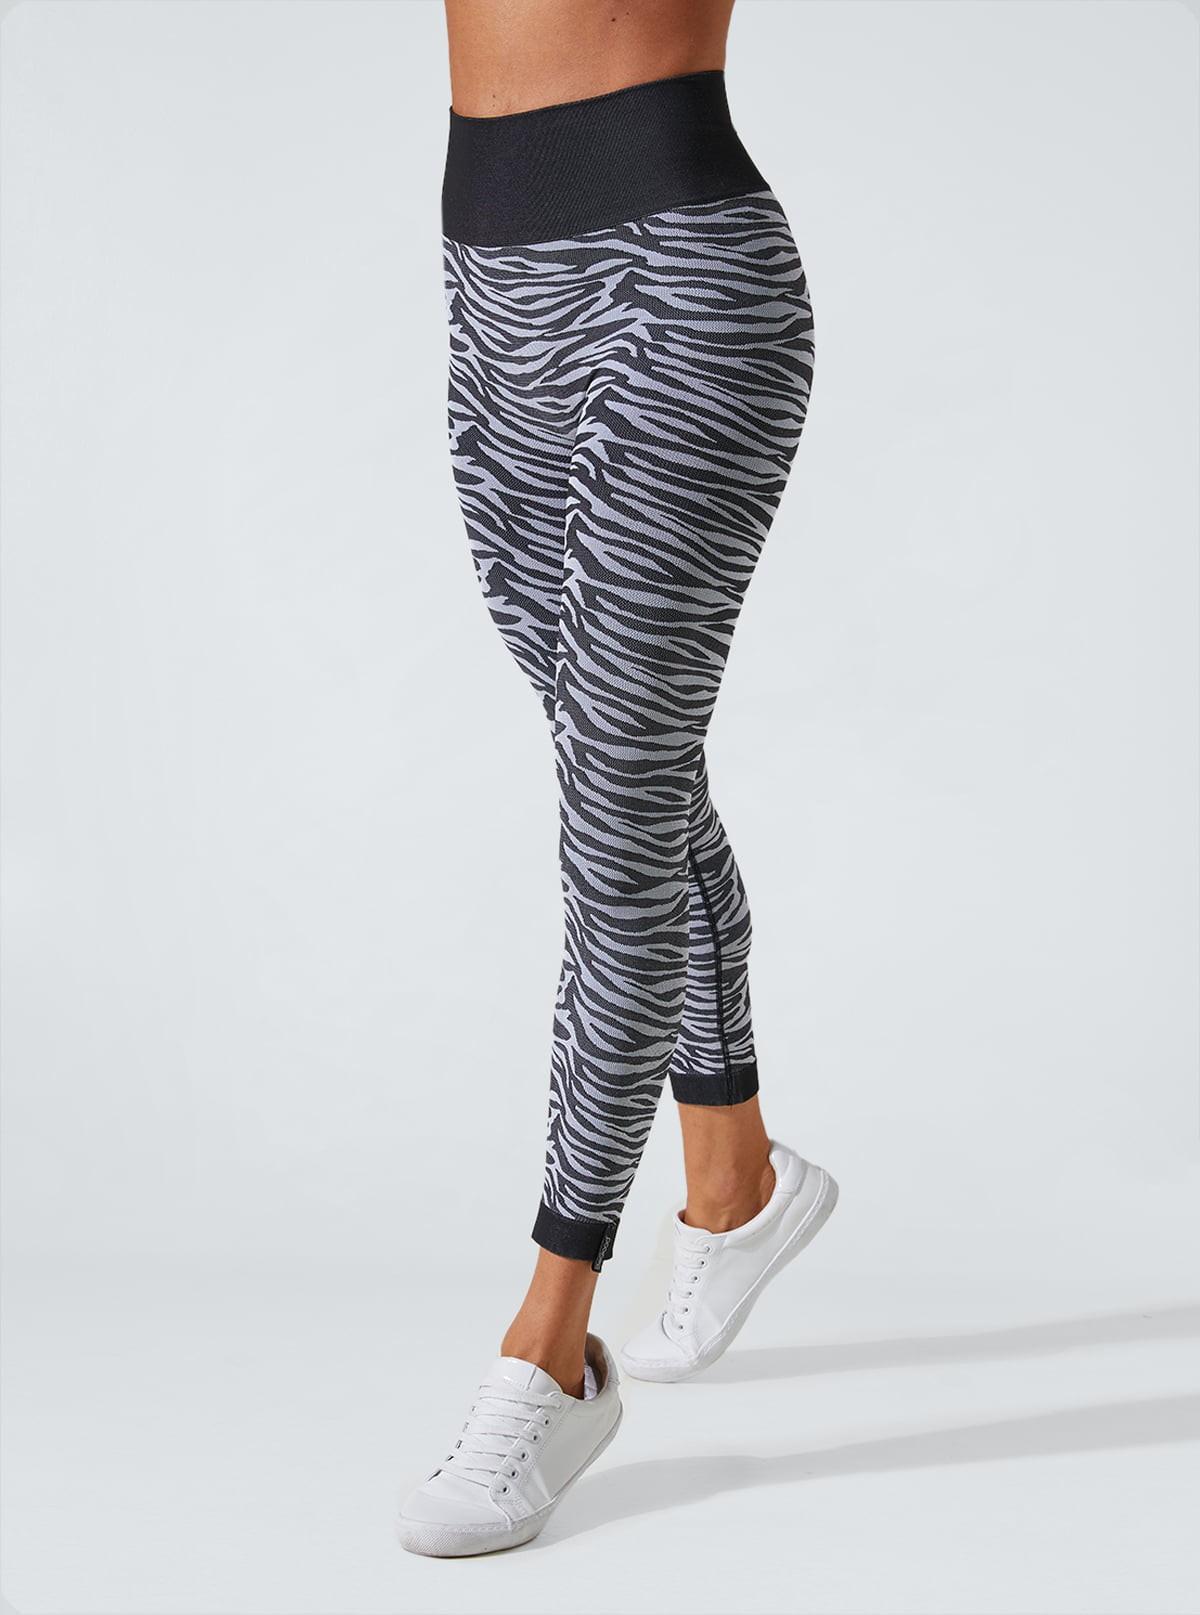 Black-White Zebra Animalier Legging in Dermofibra® Cosmetics